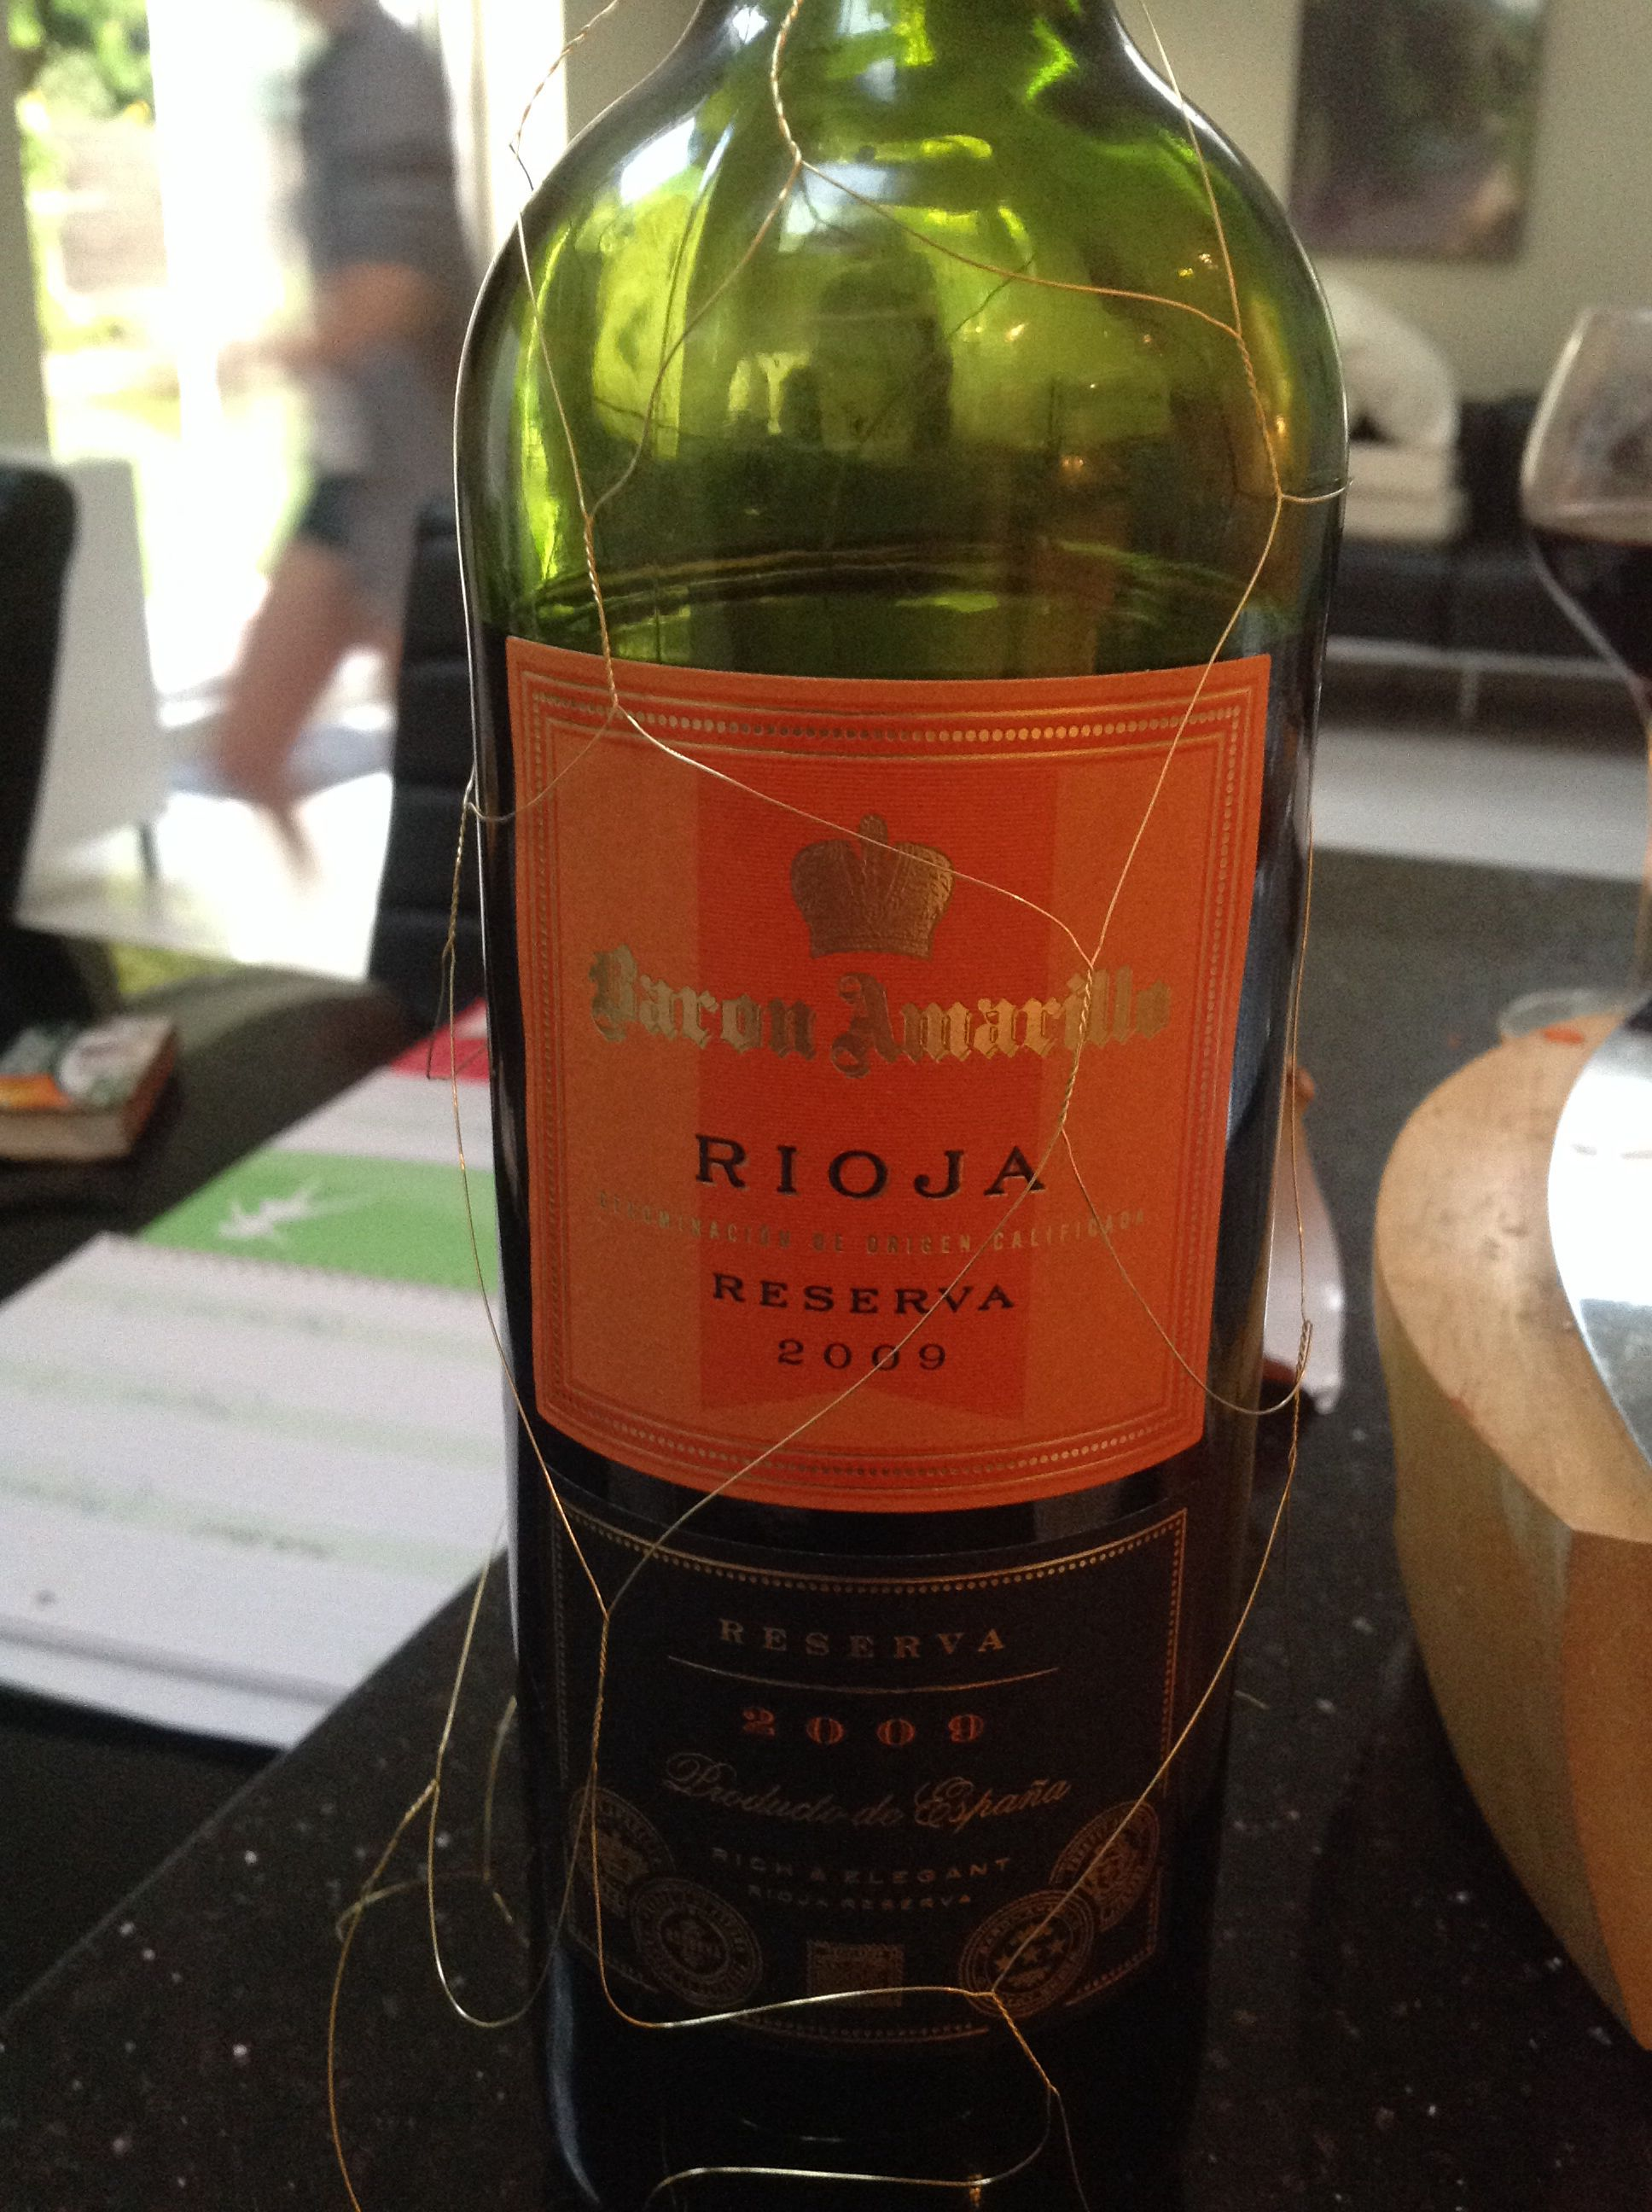 Aldi Rioja Excellent Rioja Aldi Sweet Red Wines